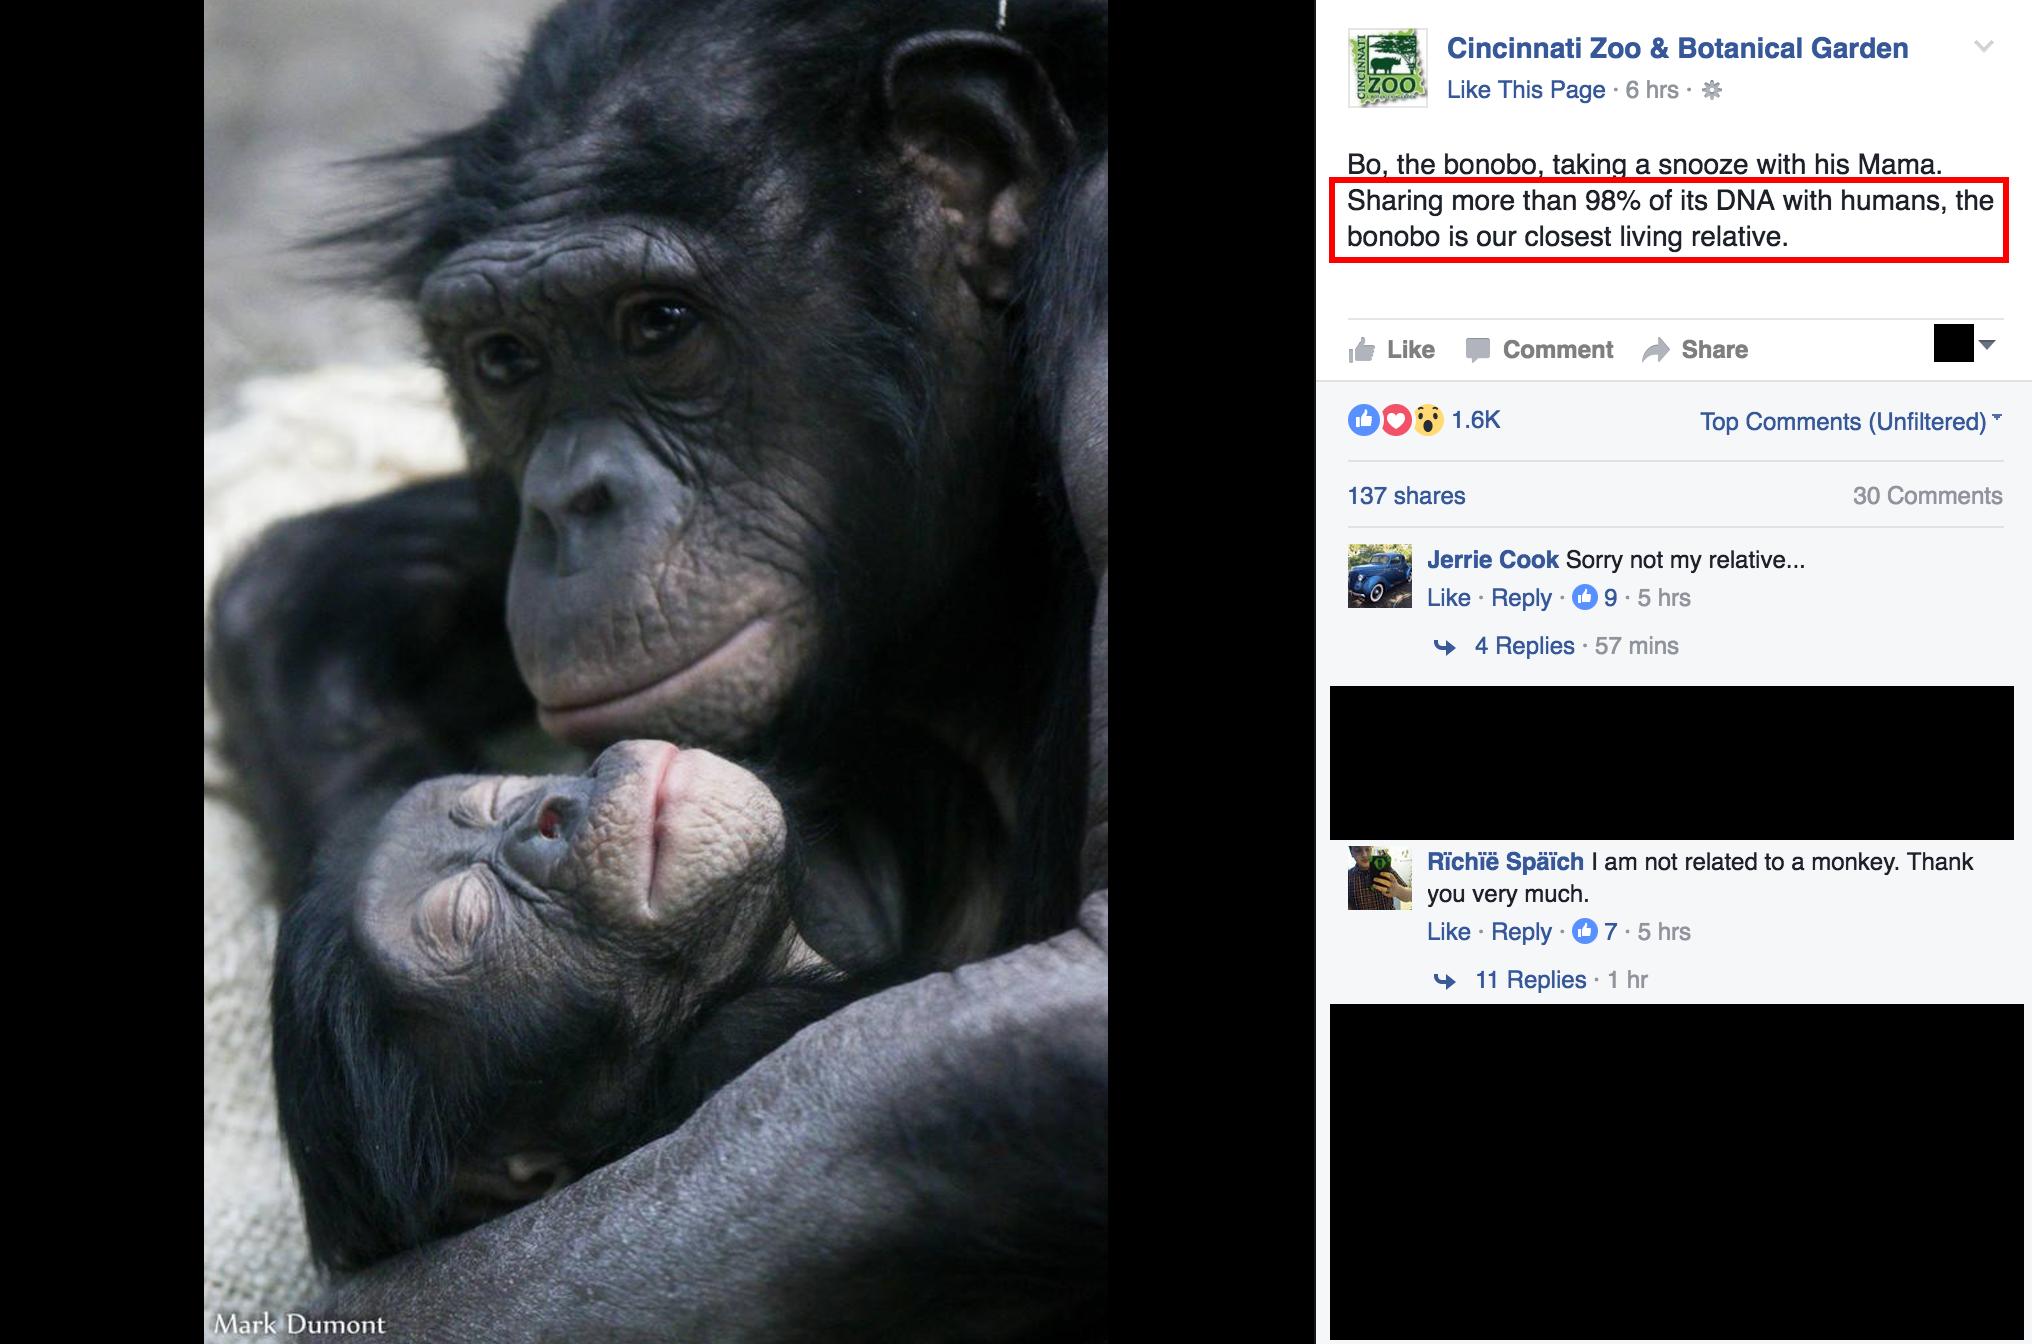 BonoboArgument2